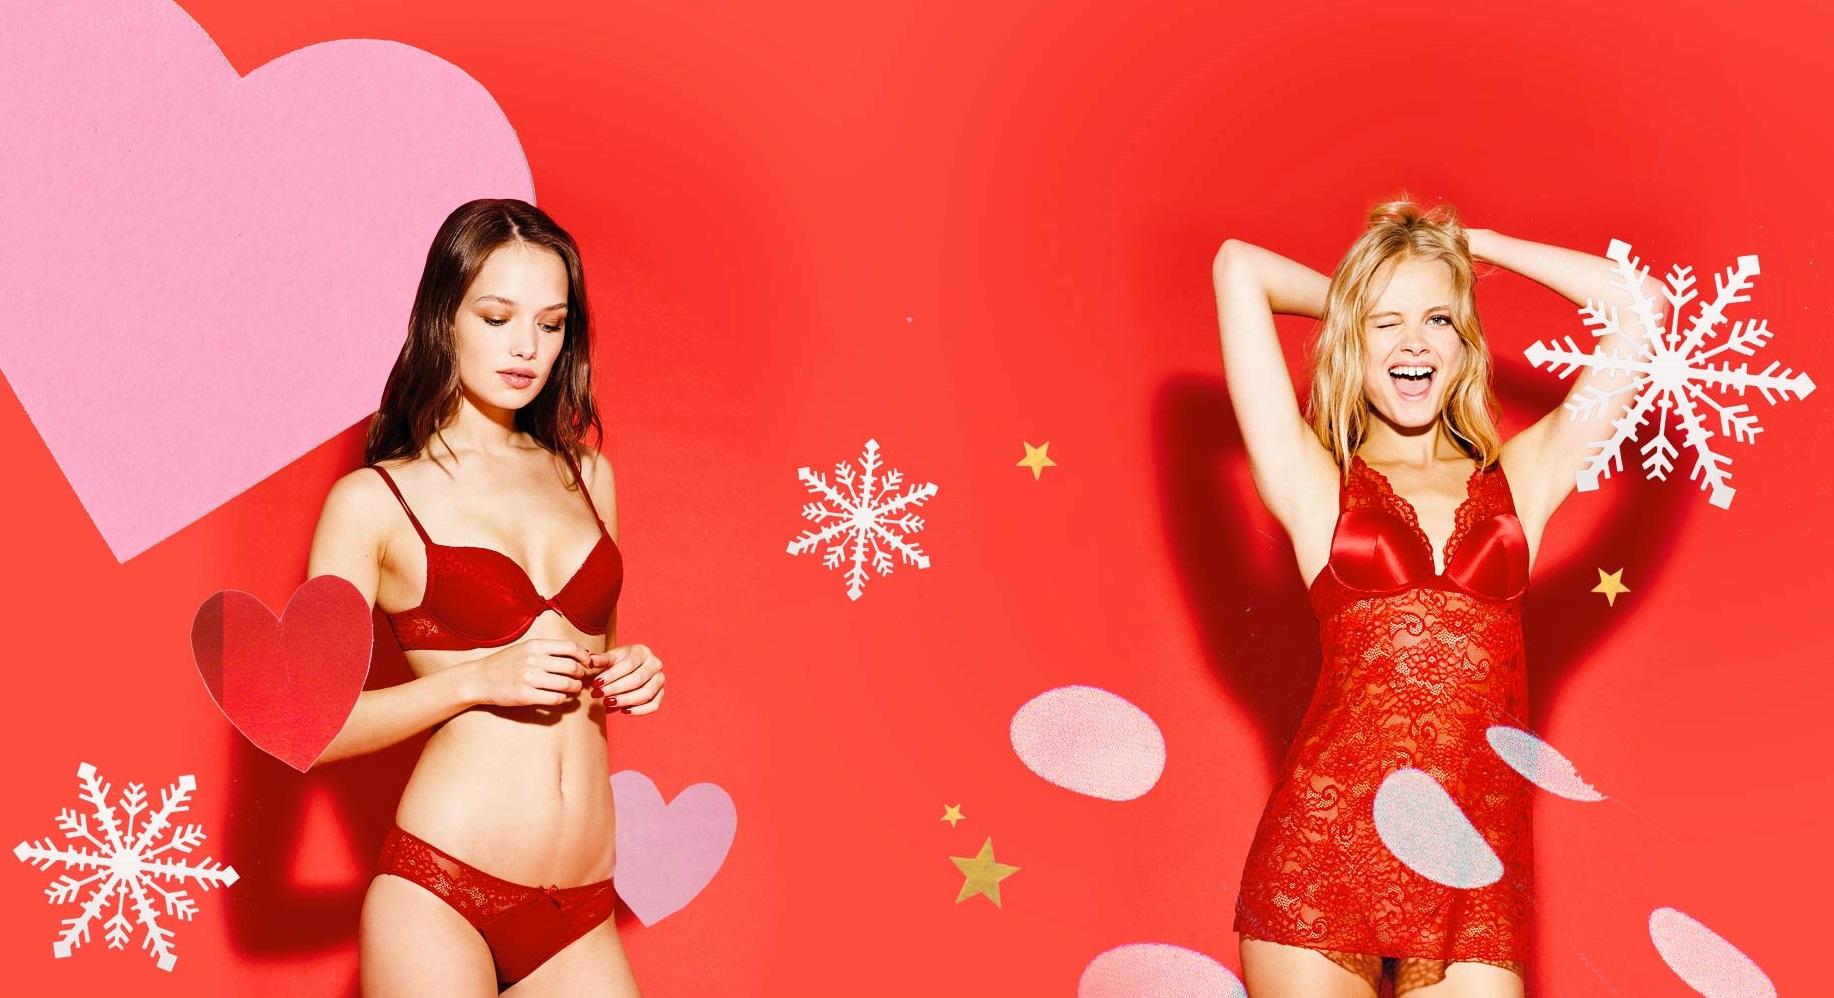 f4b07371285 Κόκκινα εσώρουχα για να σας μπει καλά το νέο έτος - Τα πιο όμορφα ...